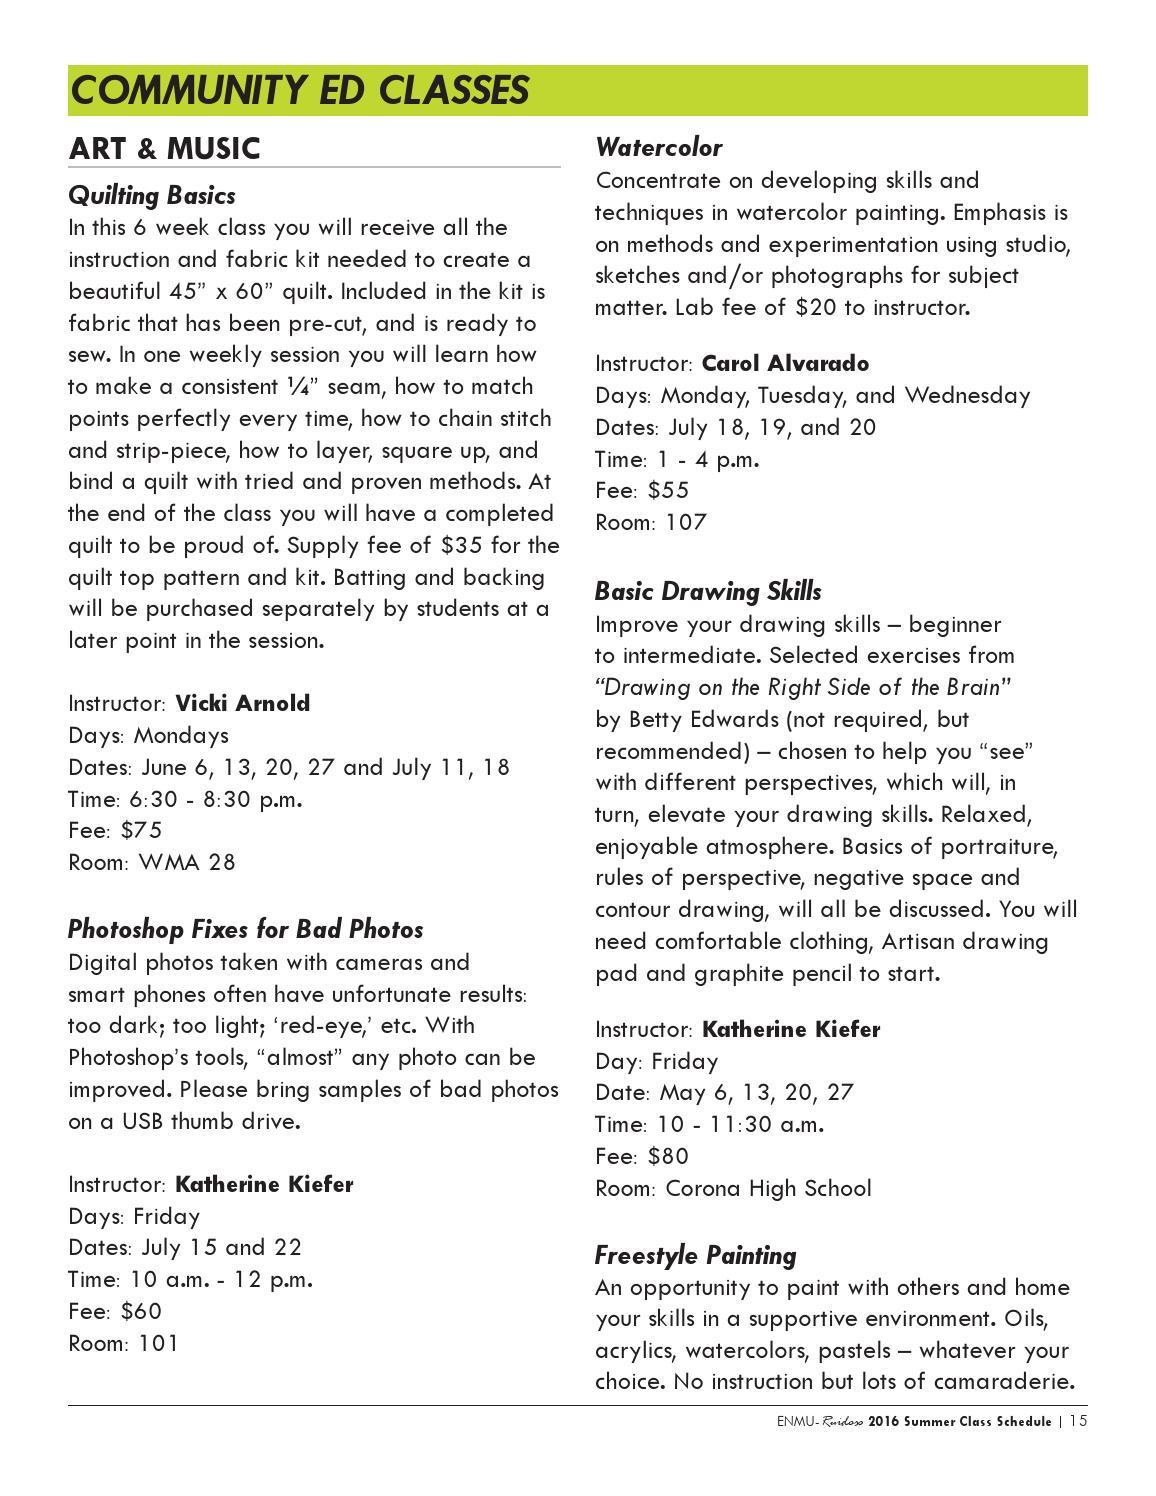 ENMU 2016 Summer Class Schedule by ENMU-Ruidoso - issuu